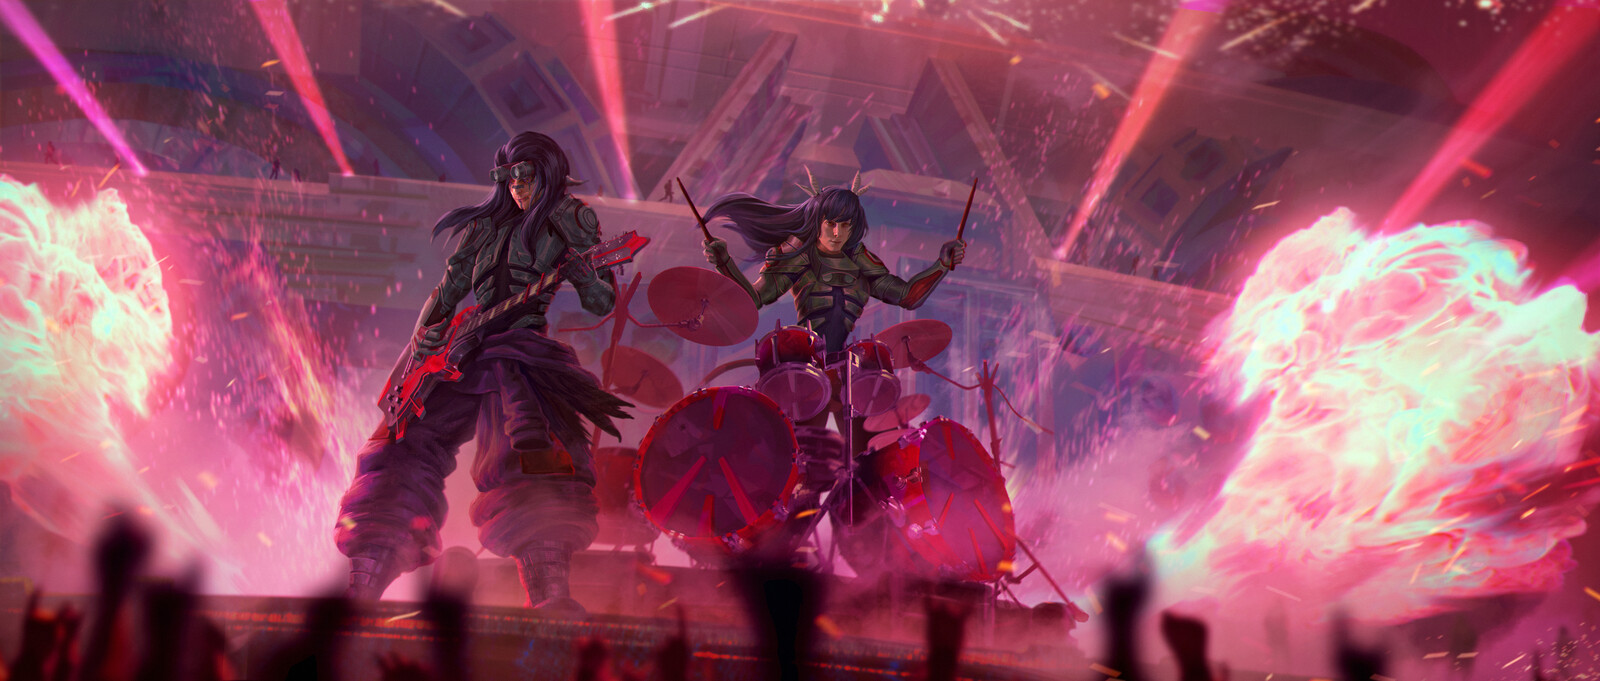 Inox and Nox Metal Duo